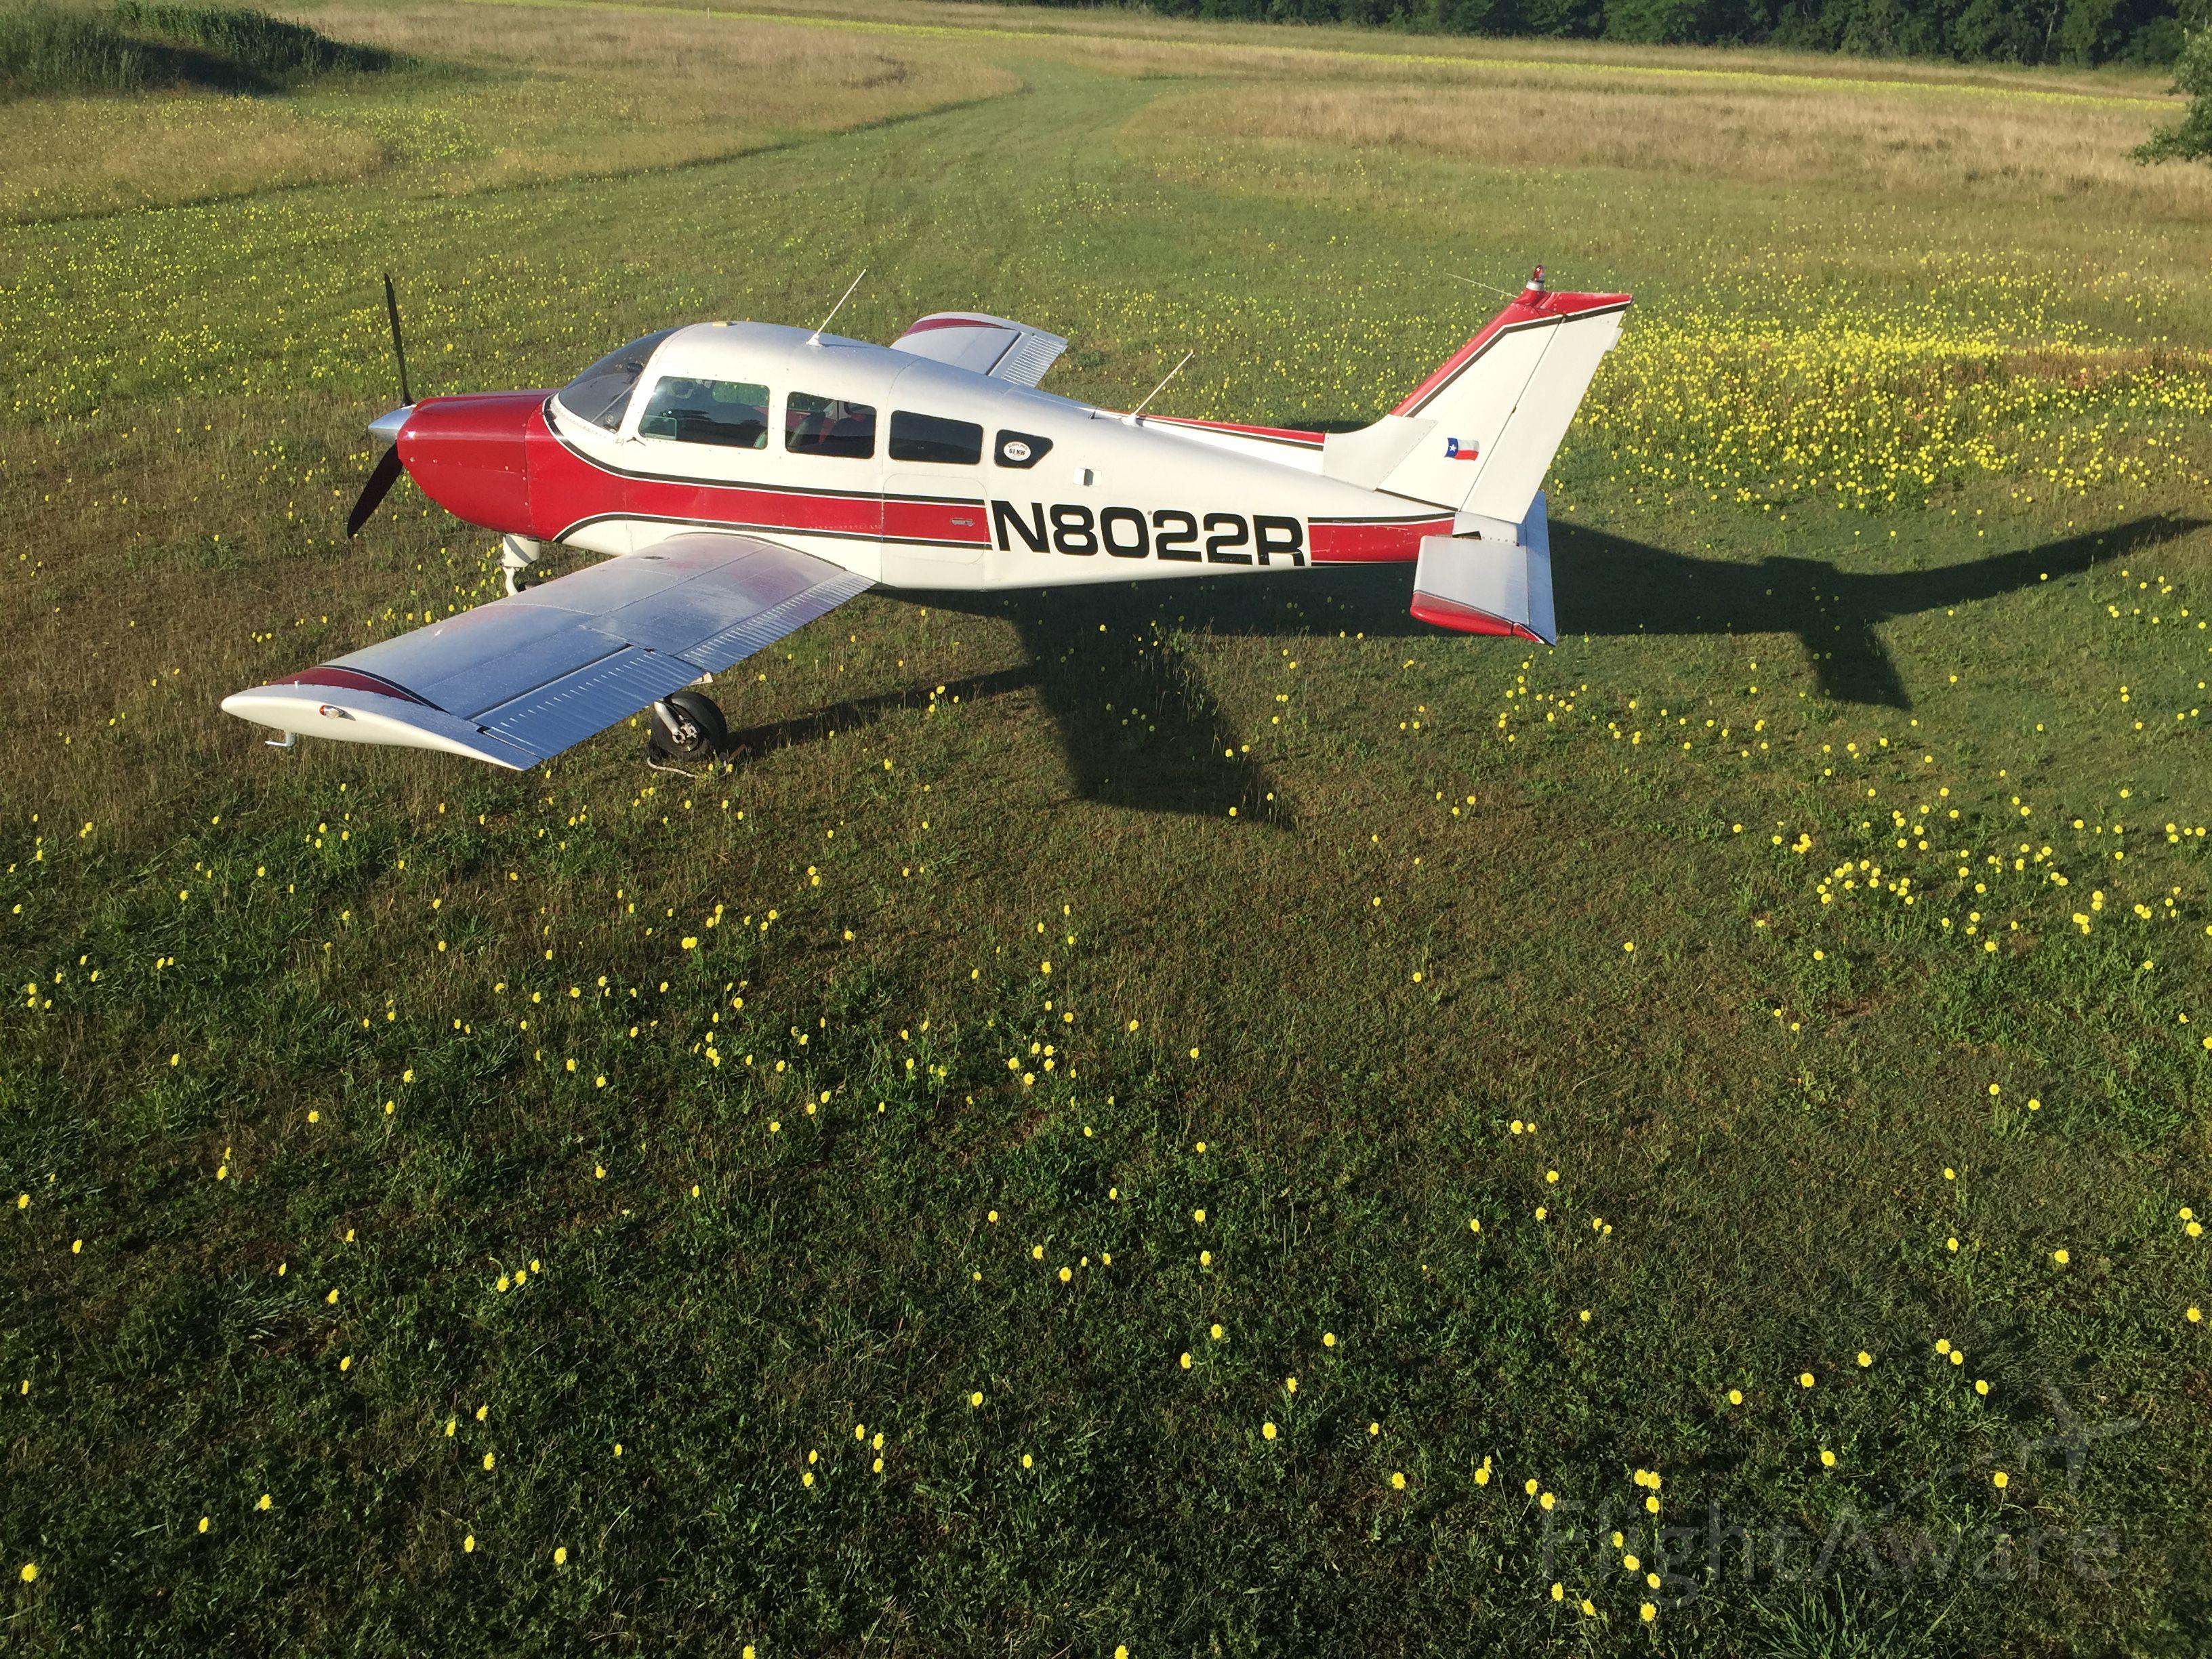 Beechcraft Sundowner (N8022R)